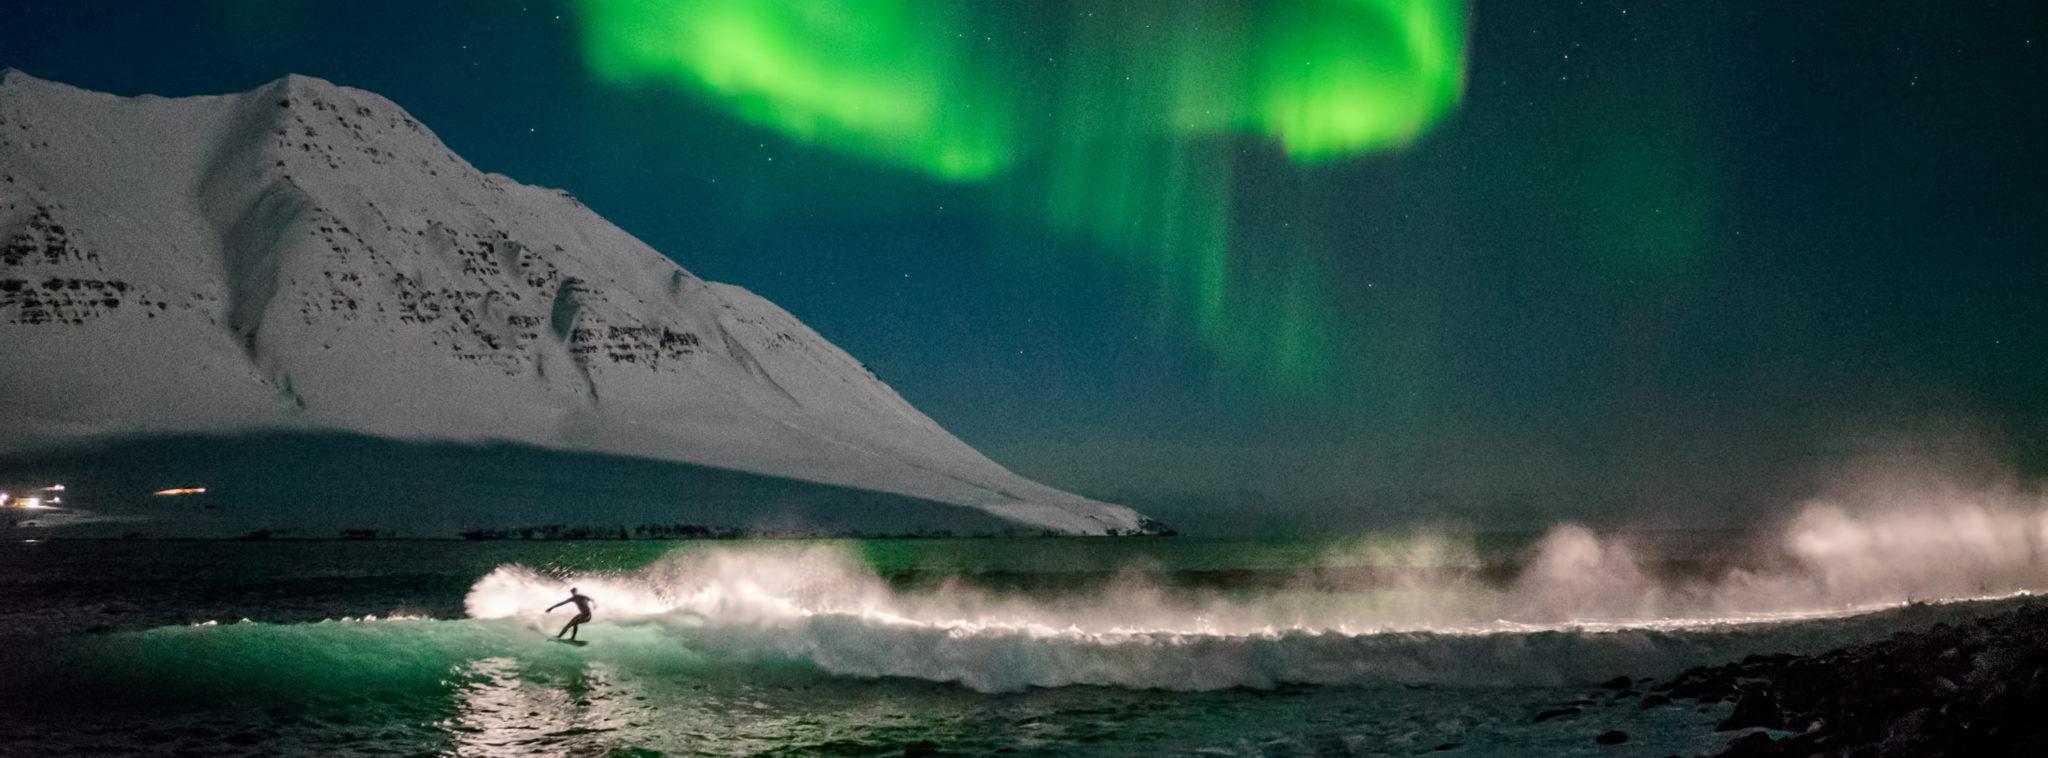 Chris-Burkard-Interview-Northern-Lights-SLider